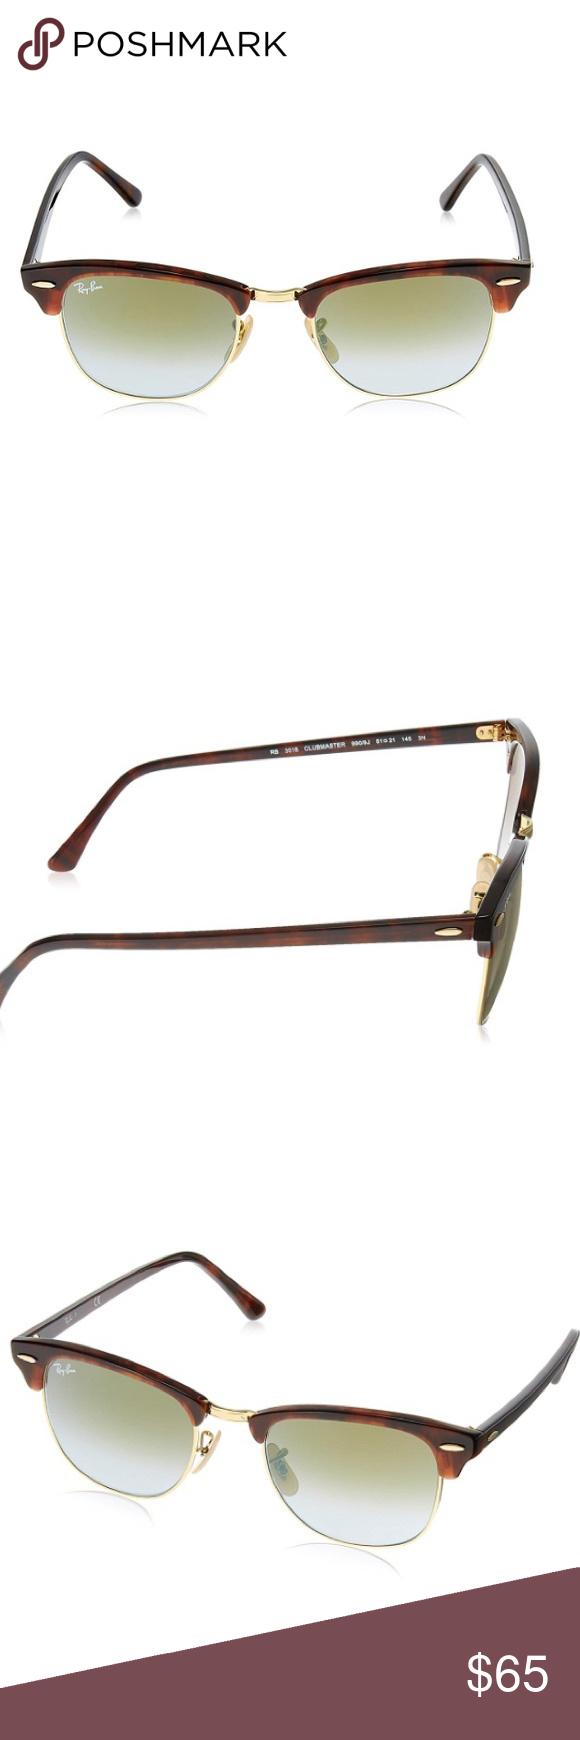 ba746931a3 Rayban sunglasses RB3016 Barely used rayban sunglasses Accessories  Sunglasses